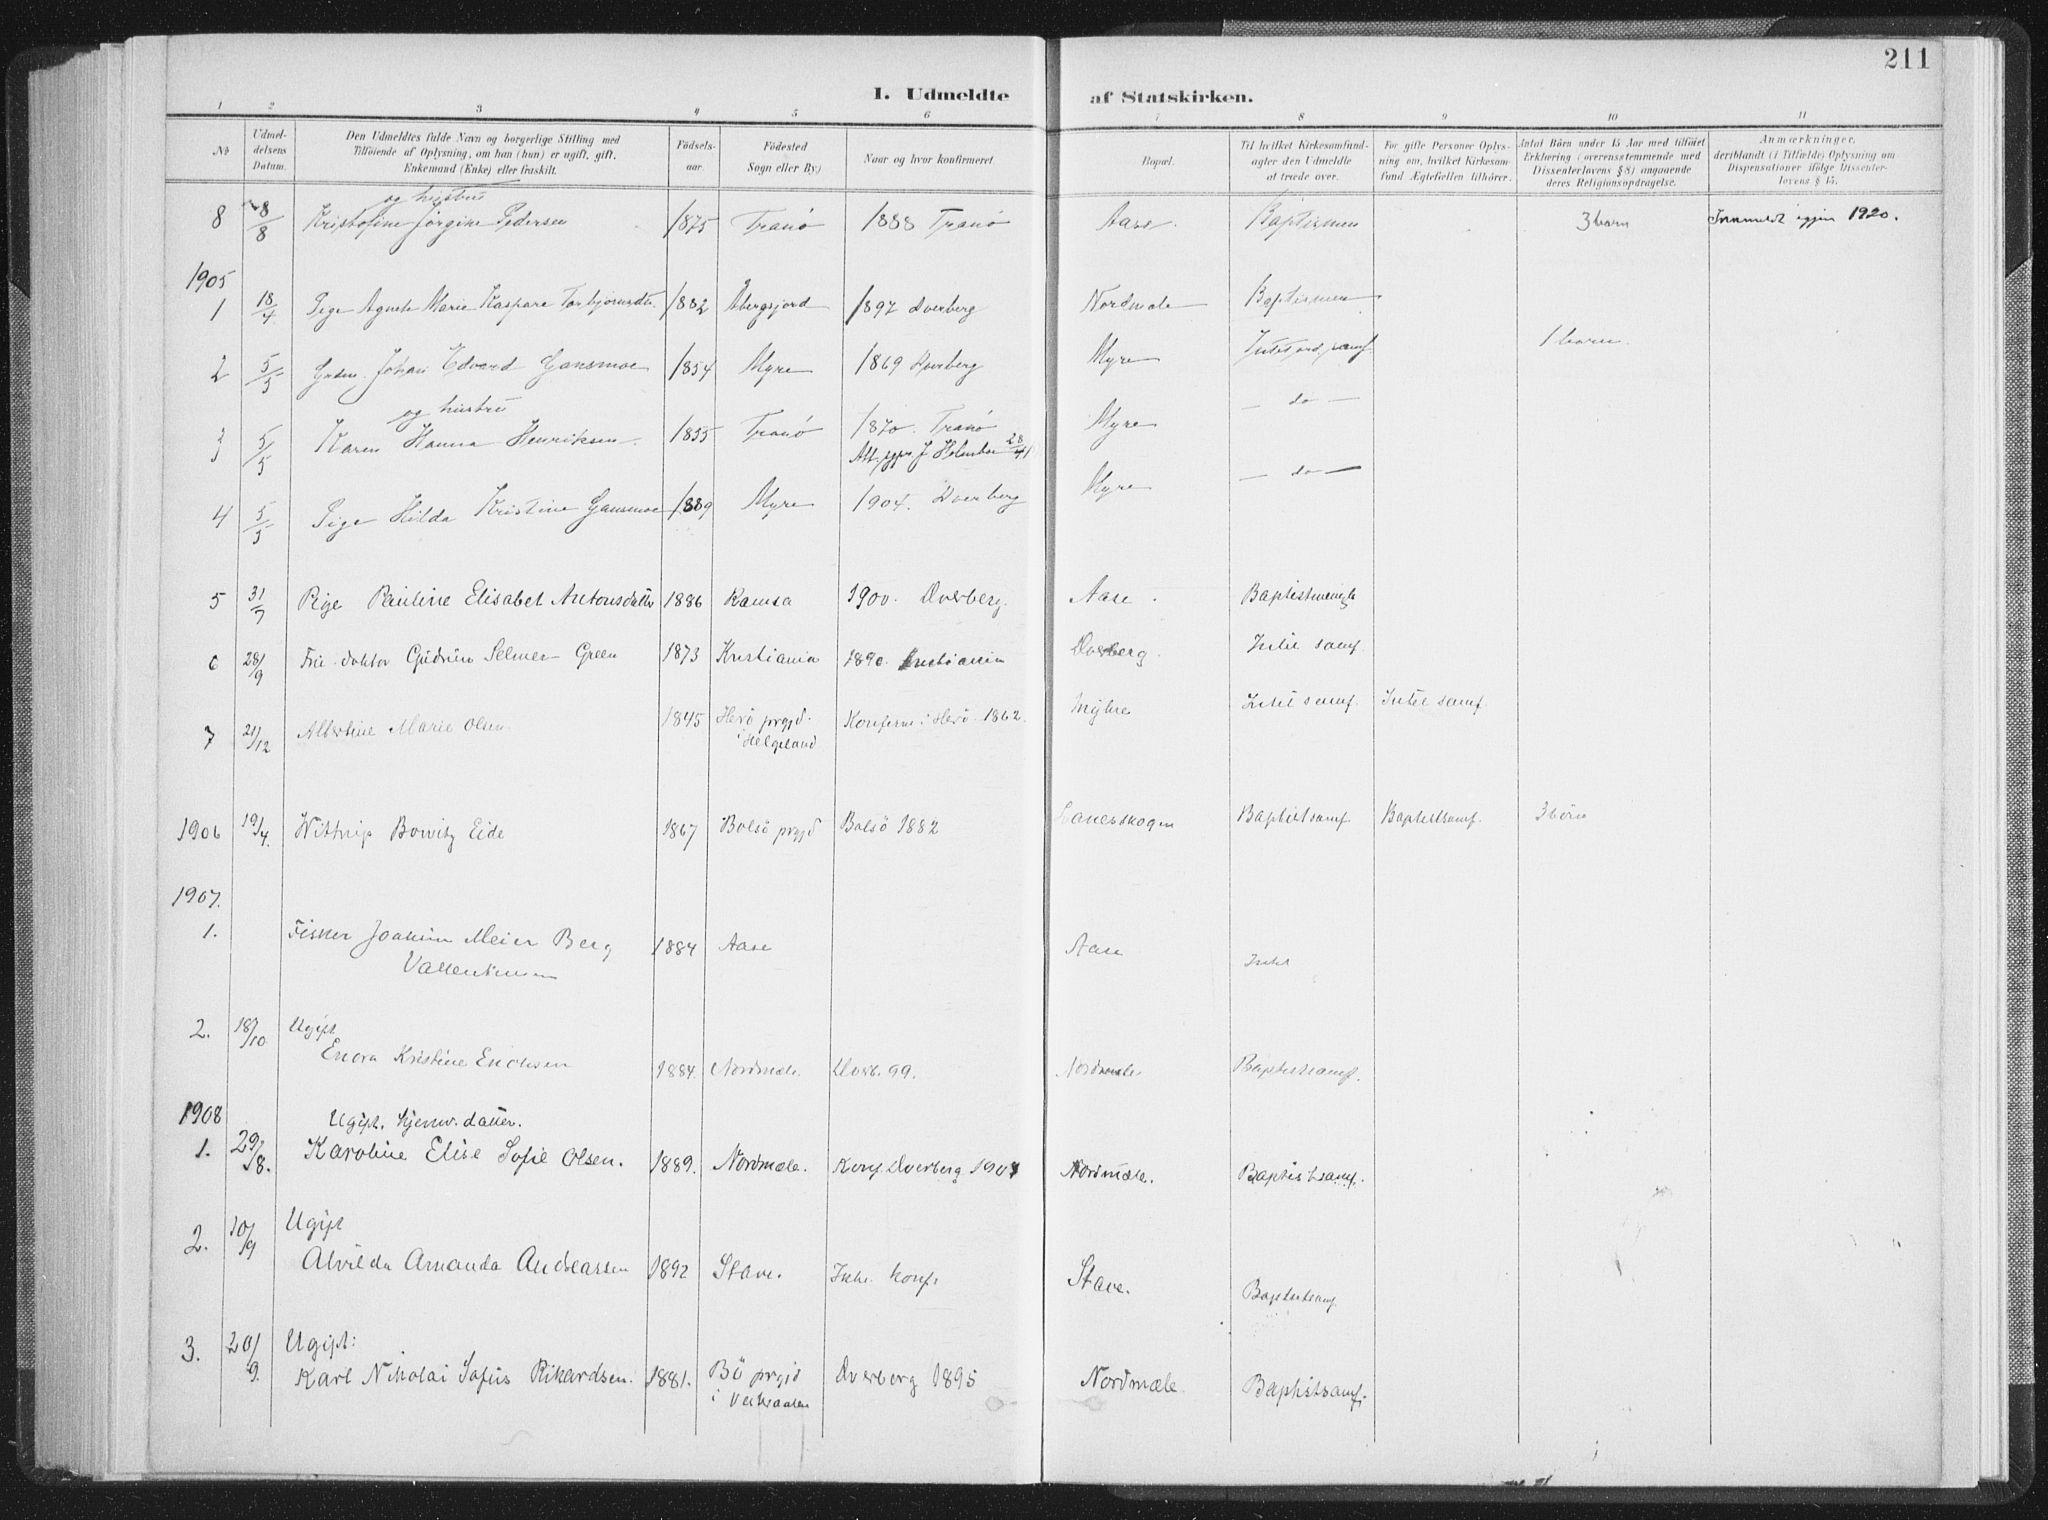 SAT, Ministerialprotokoller, klokkerbøker og fødselsregistre - Nordland, 897/L1400: Ministerialbok nr. 897A07, 1897-1908, s. 211